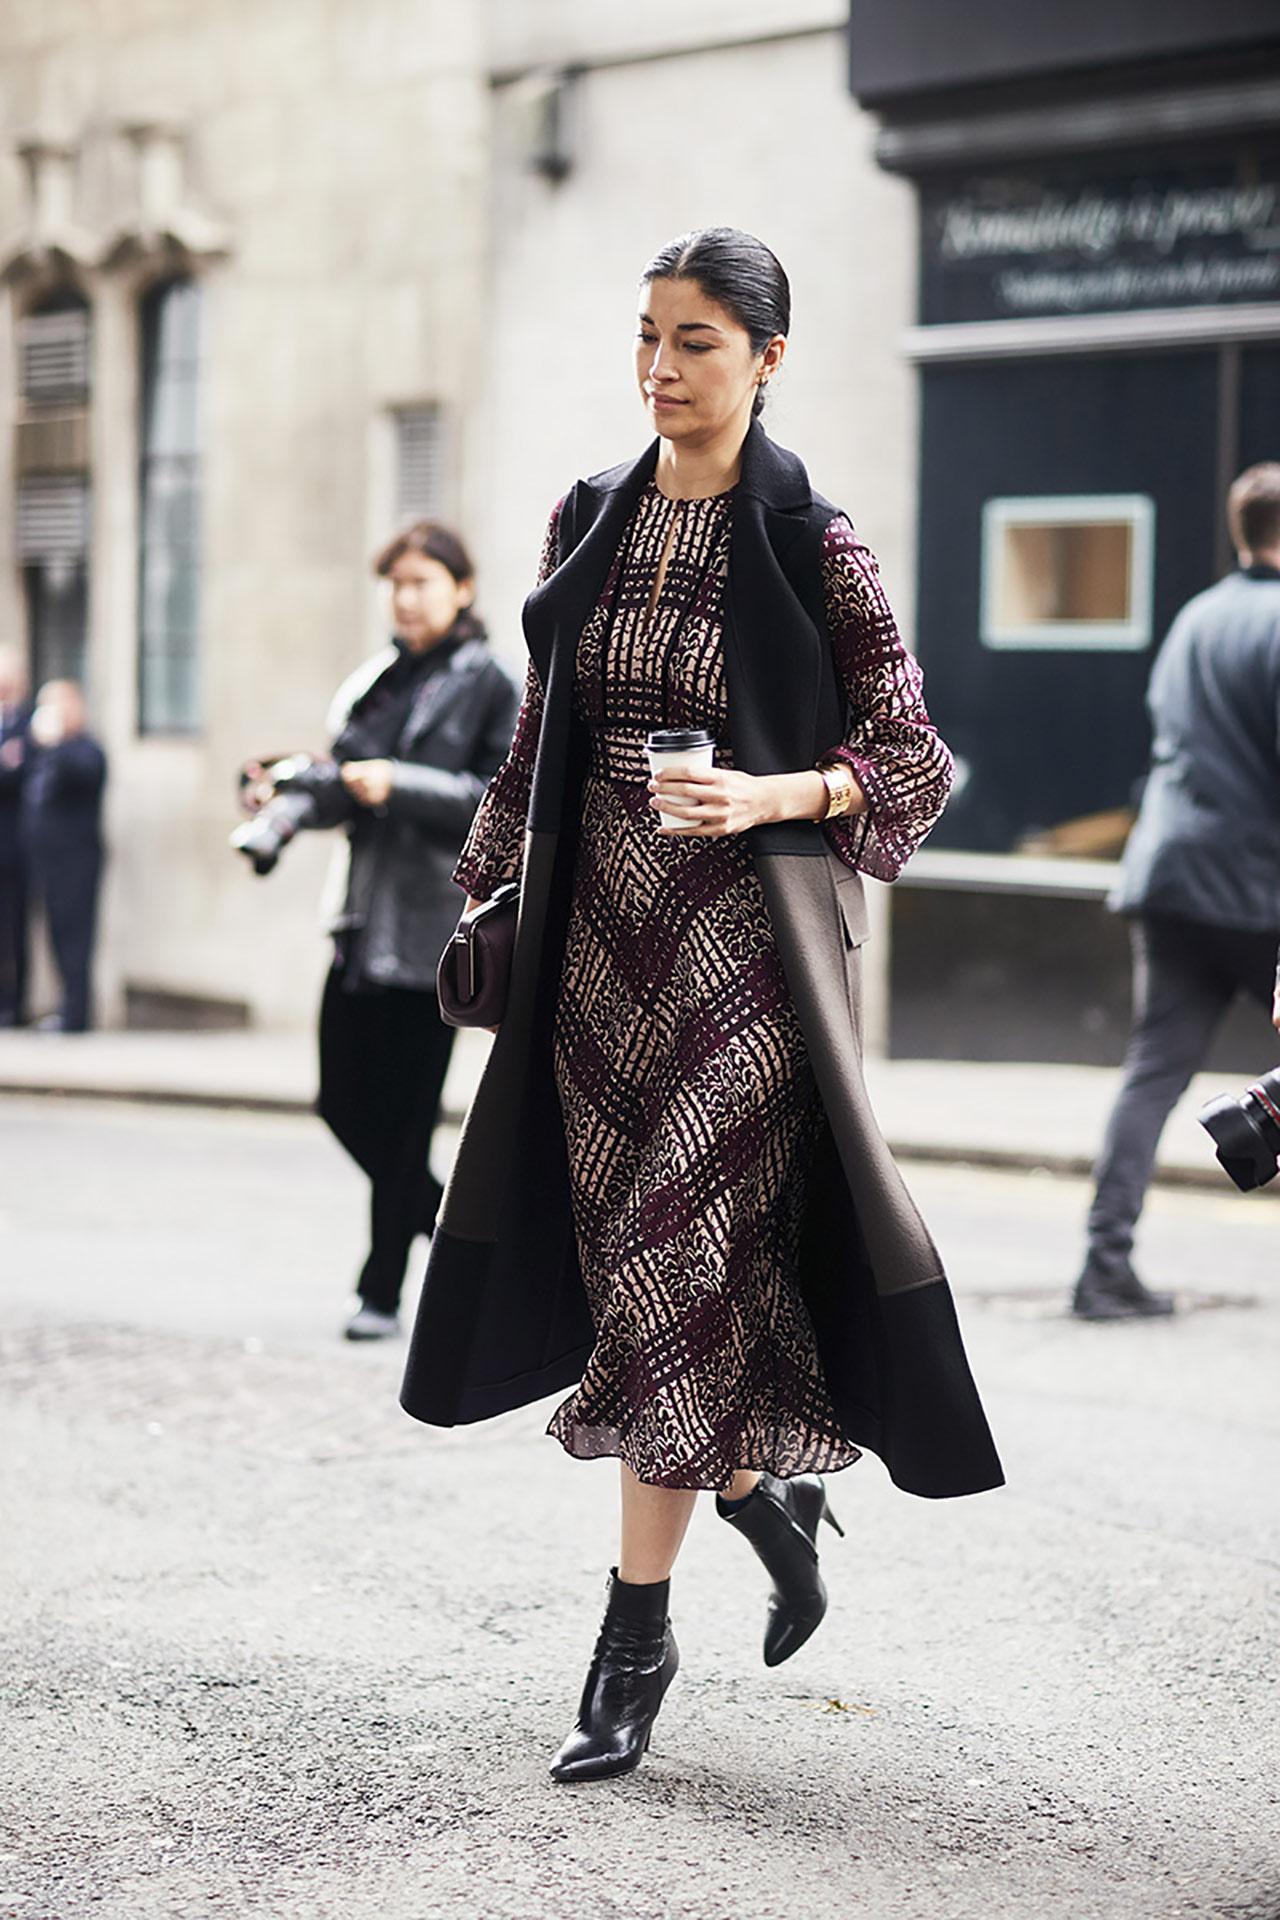 London fashion trends winter 2018